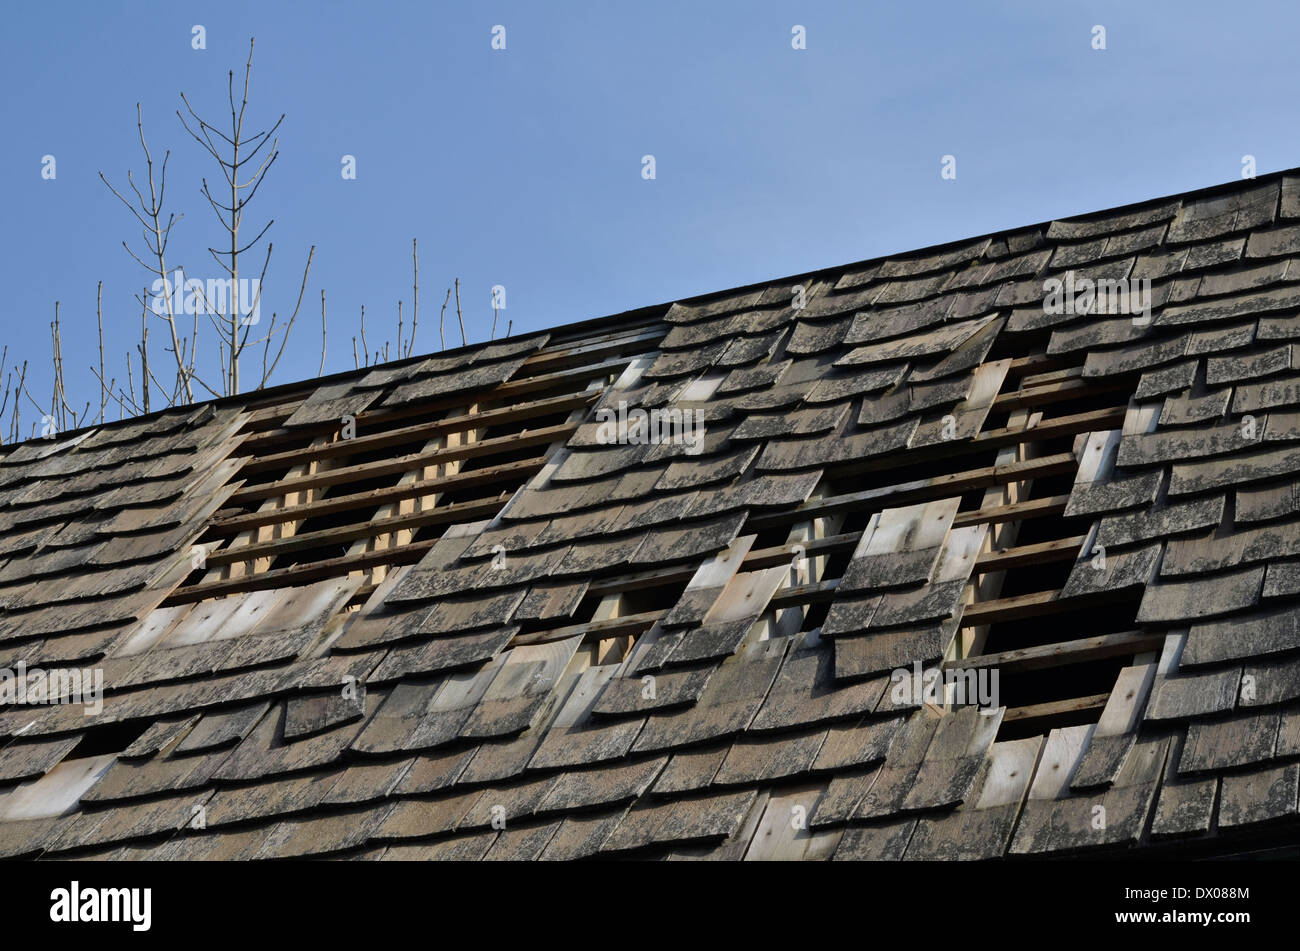 Wooden tiled roof damaged by storm. Possible poor workmanship metaphor. - Stock Image